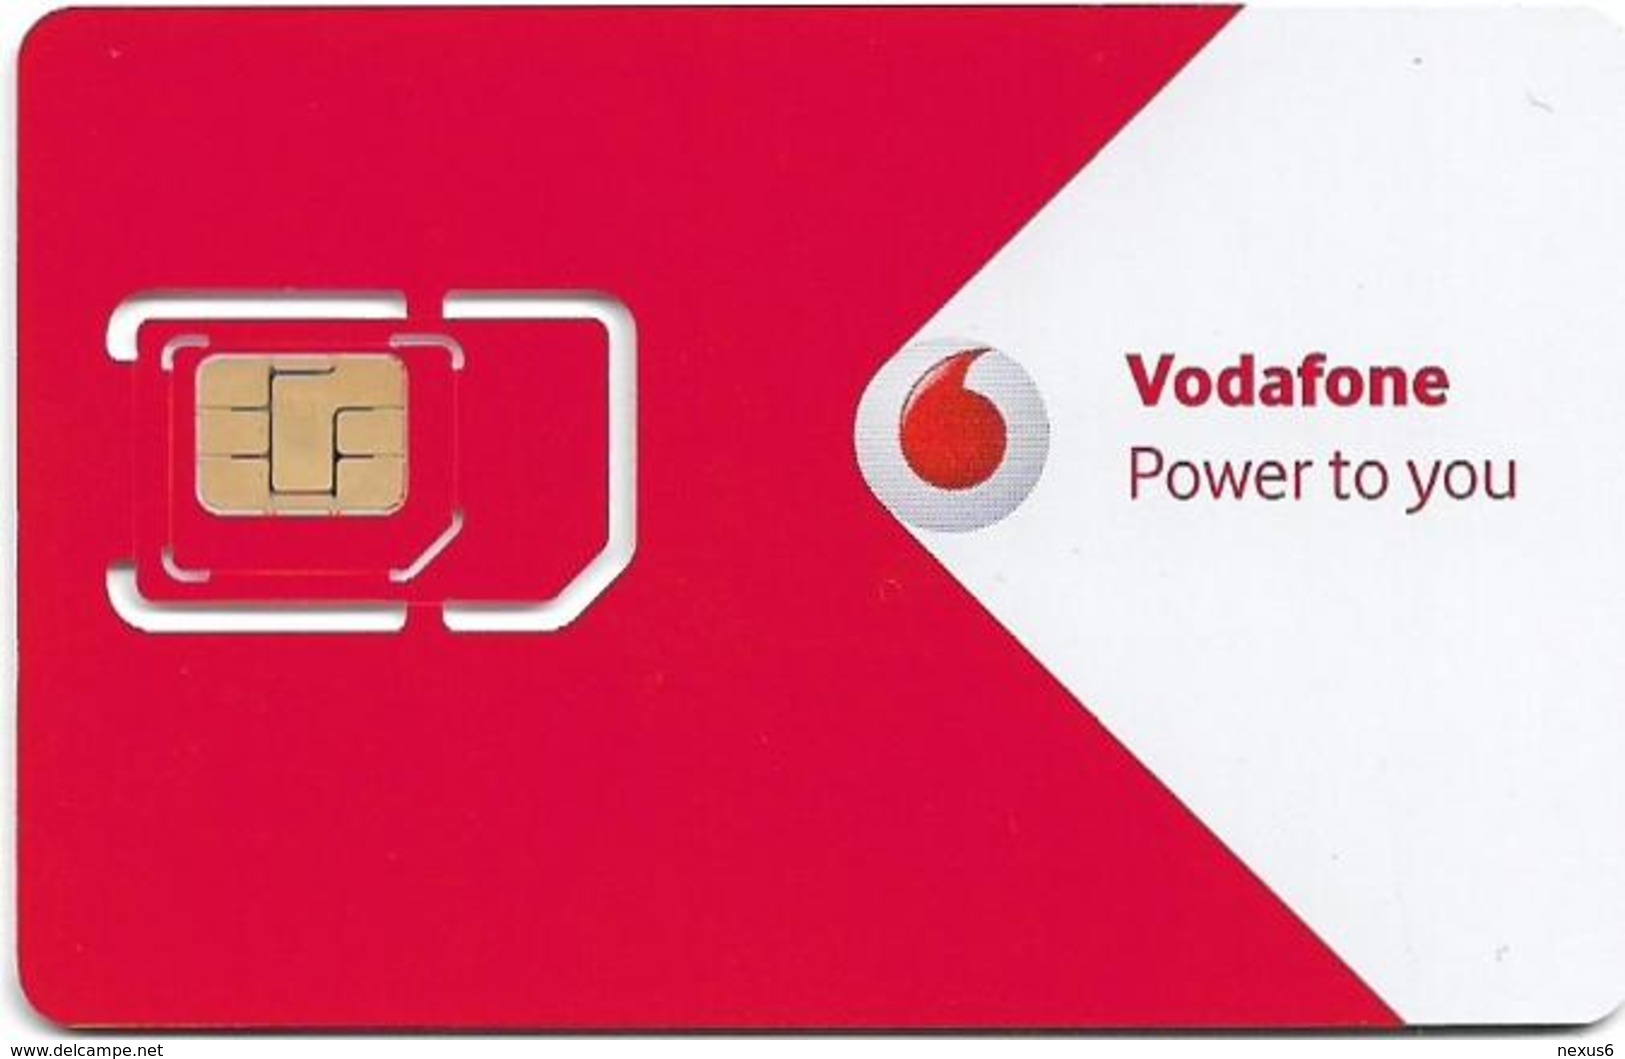 Greece - Vodafone (Red & White 'Cardphone Vodafone') GSM SIM, Mint - Greece